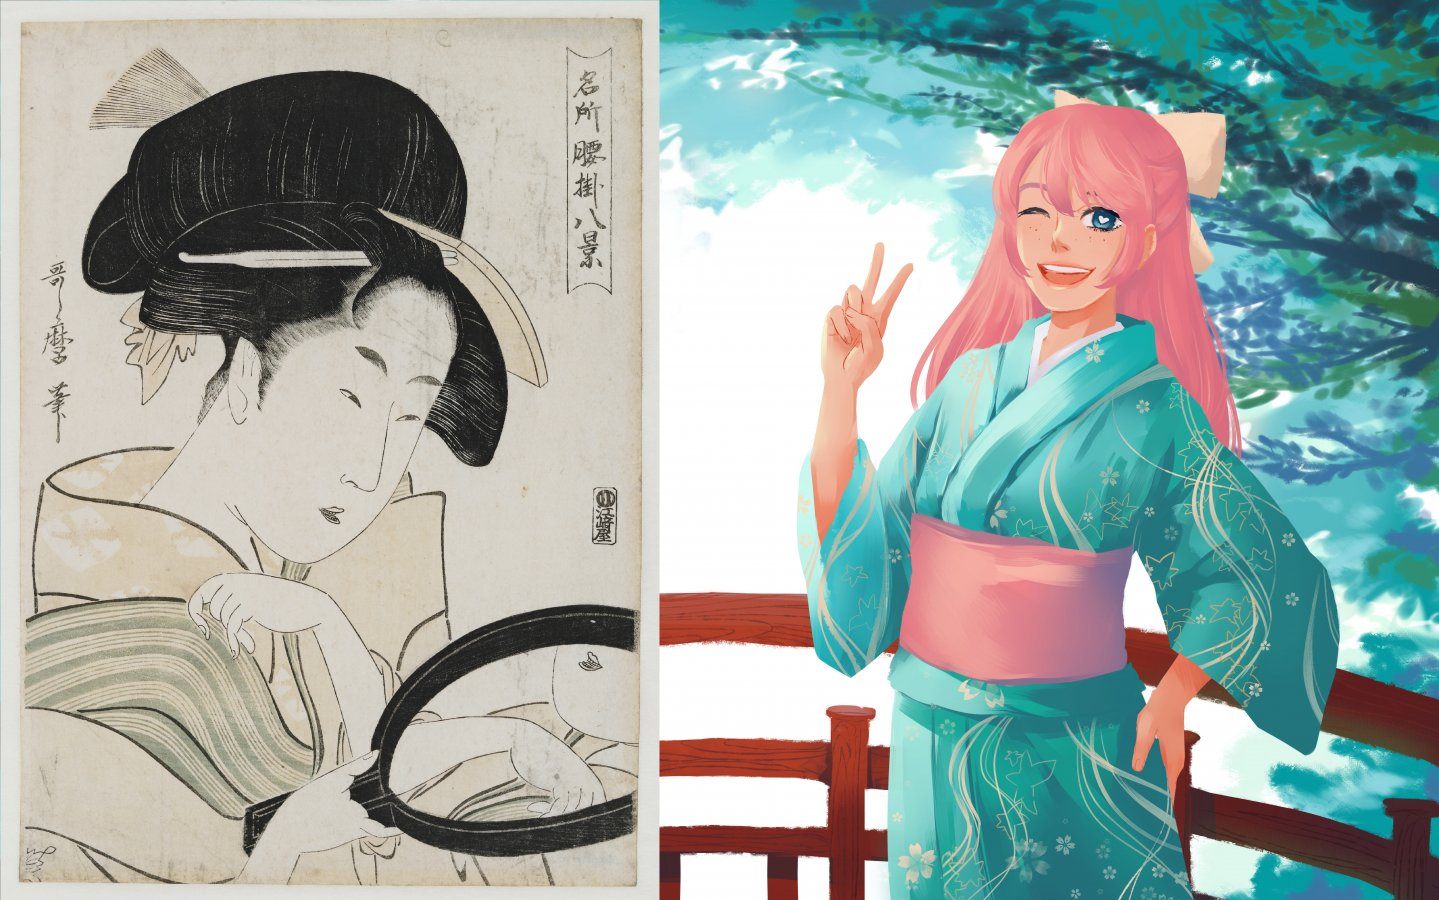 Kitagawa Utamaro, Schminkszene / Pummelpanda, Magical Girl (Collage AMBR) © Giverny, Fondation Claude Monet / Pummelpanda 2018